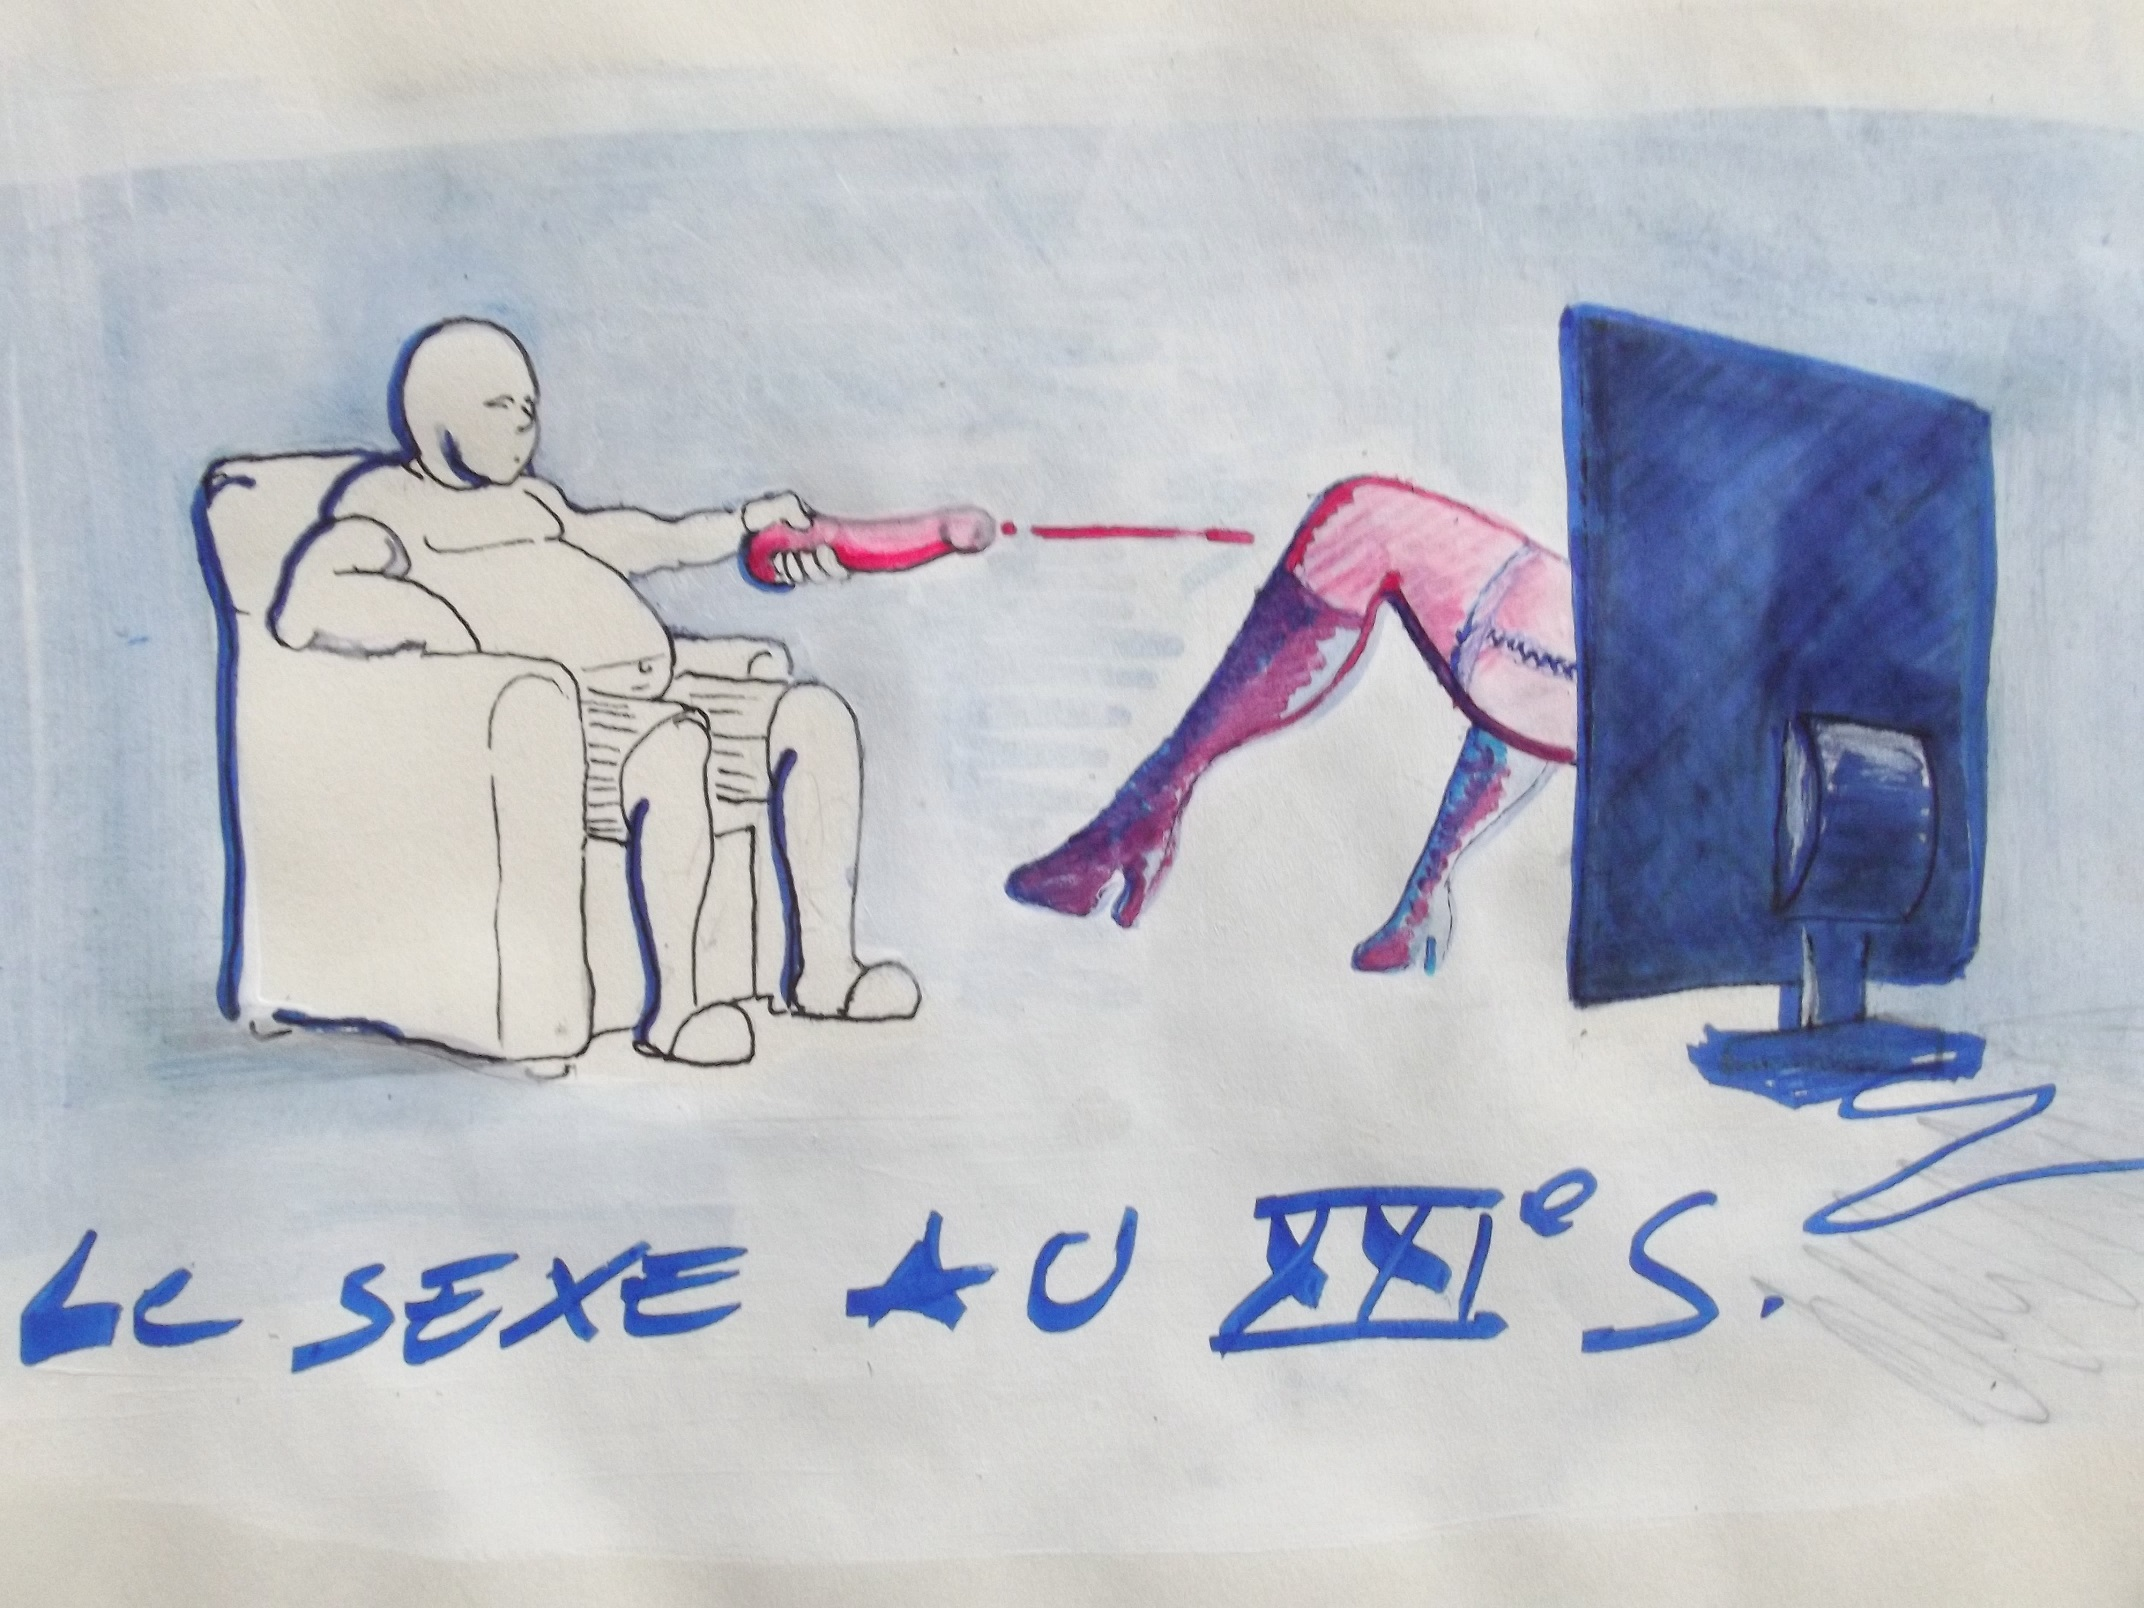 rencontre couple sexe colchester